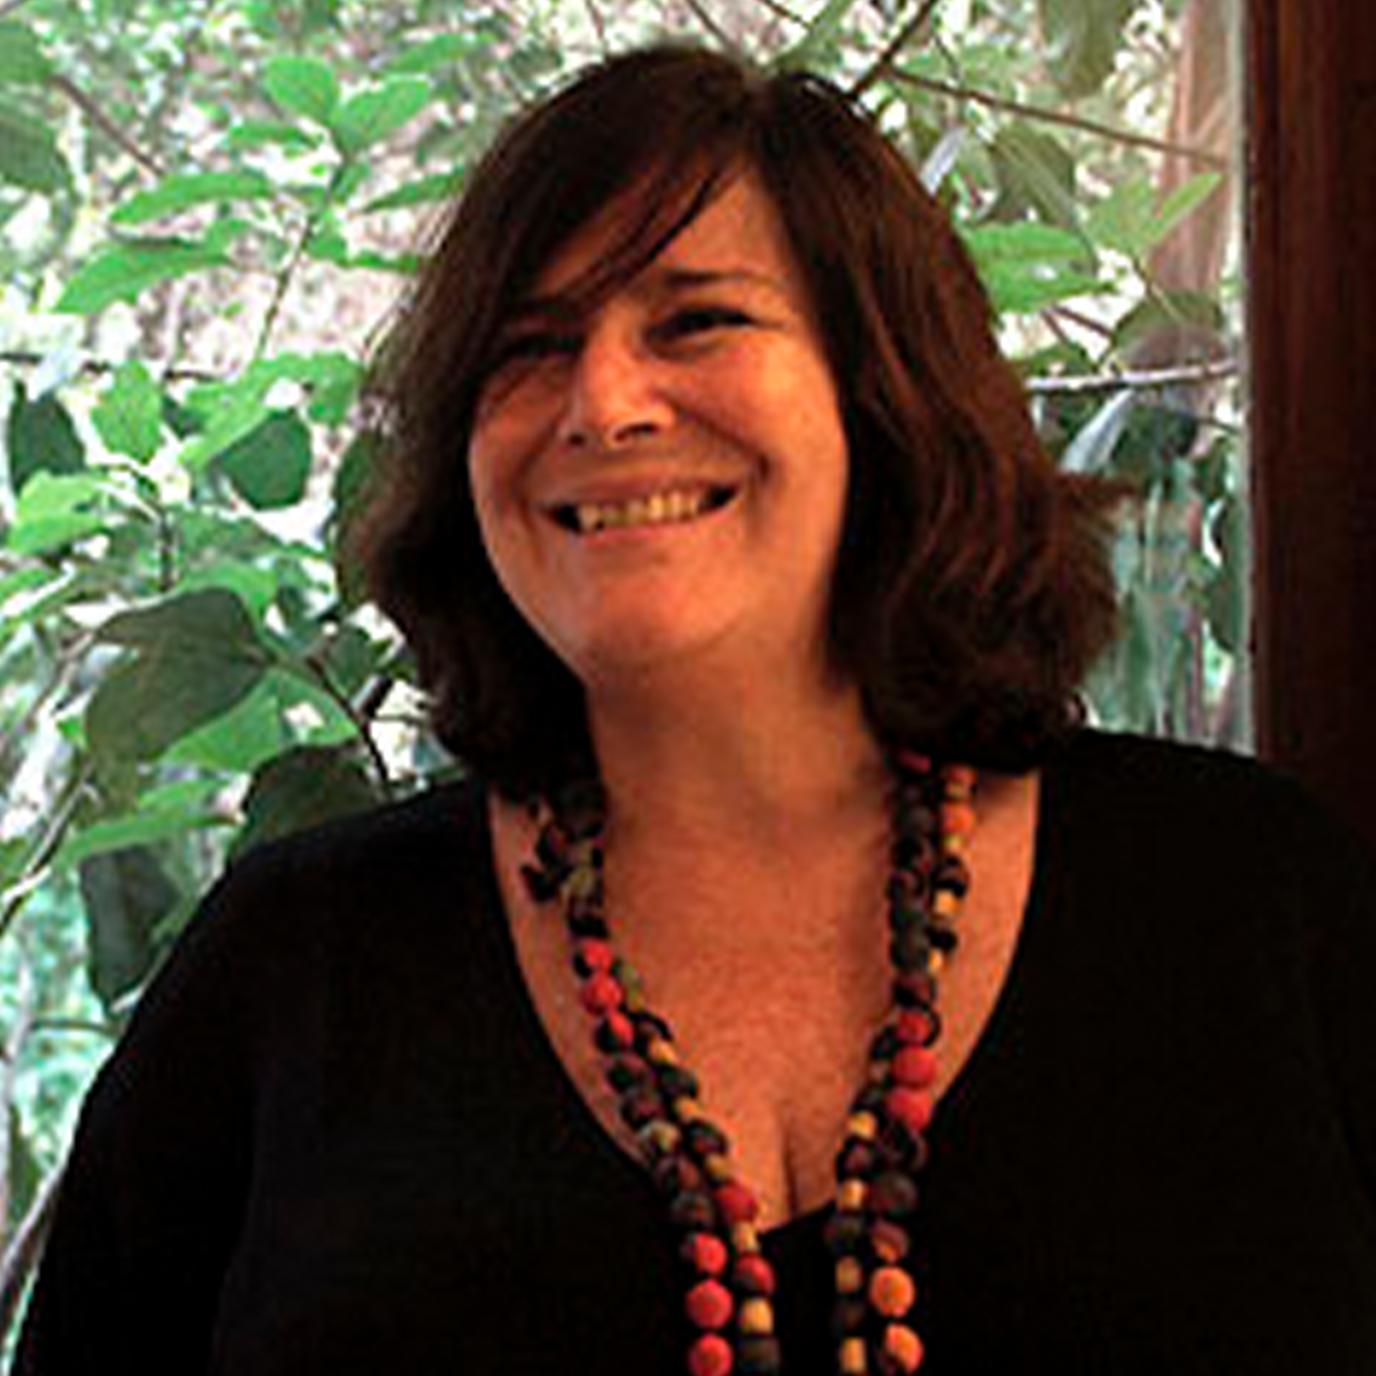 Ana Lobo - Designer de Produto. Coordenadora de projetos.